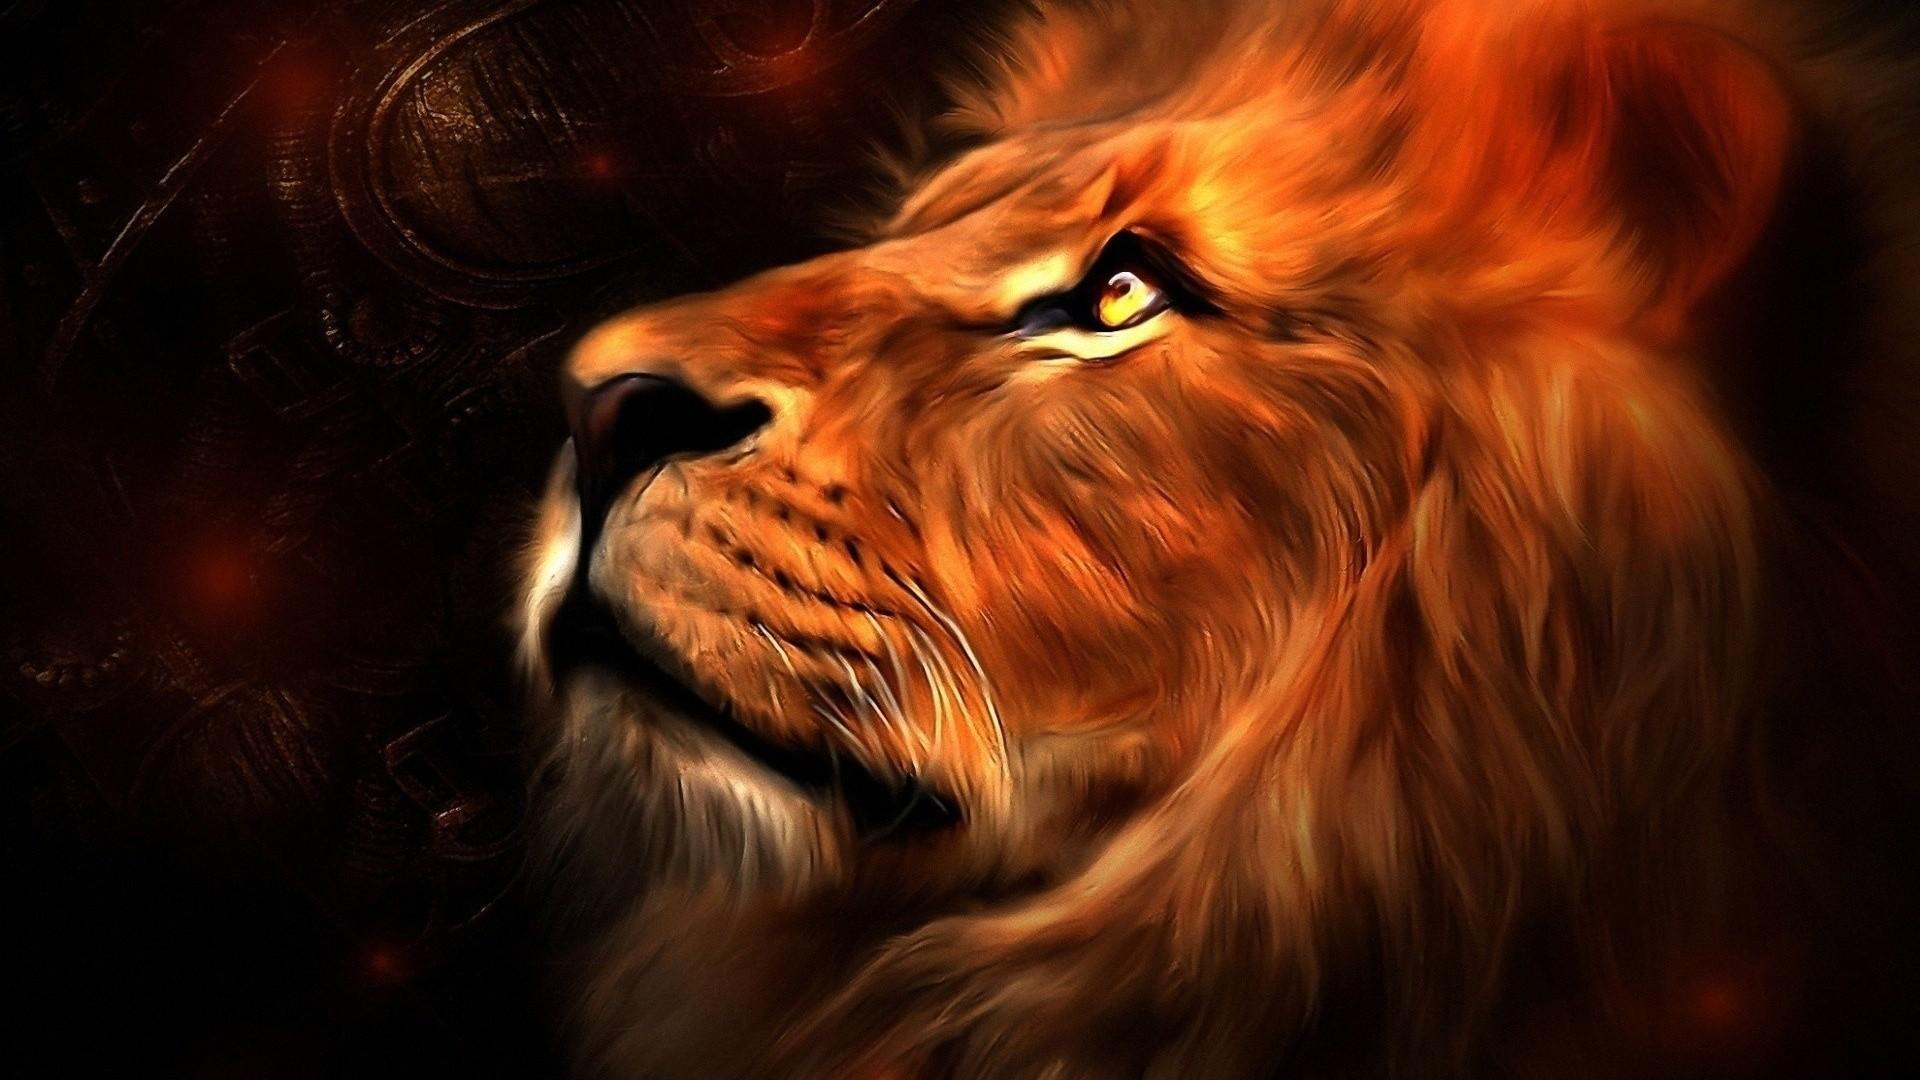 Lion Of Judah Wallpaper Wallpapertag